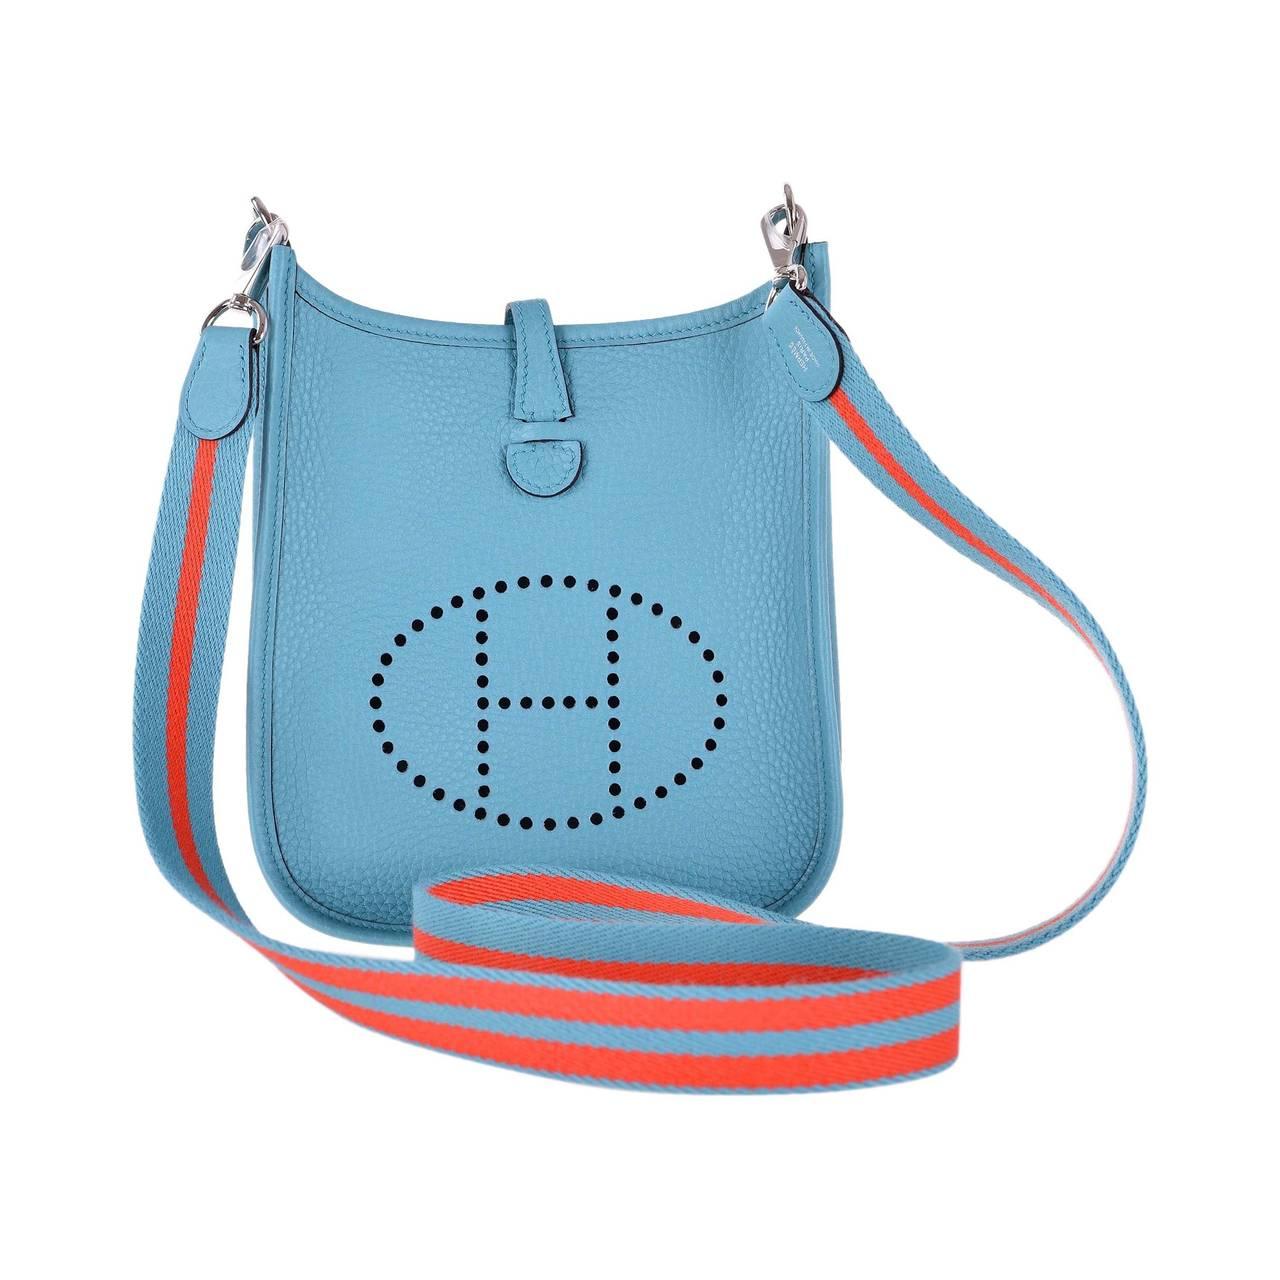 Hermes Evelyne Mini Birkin Bags Replica